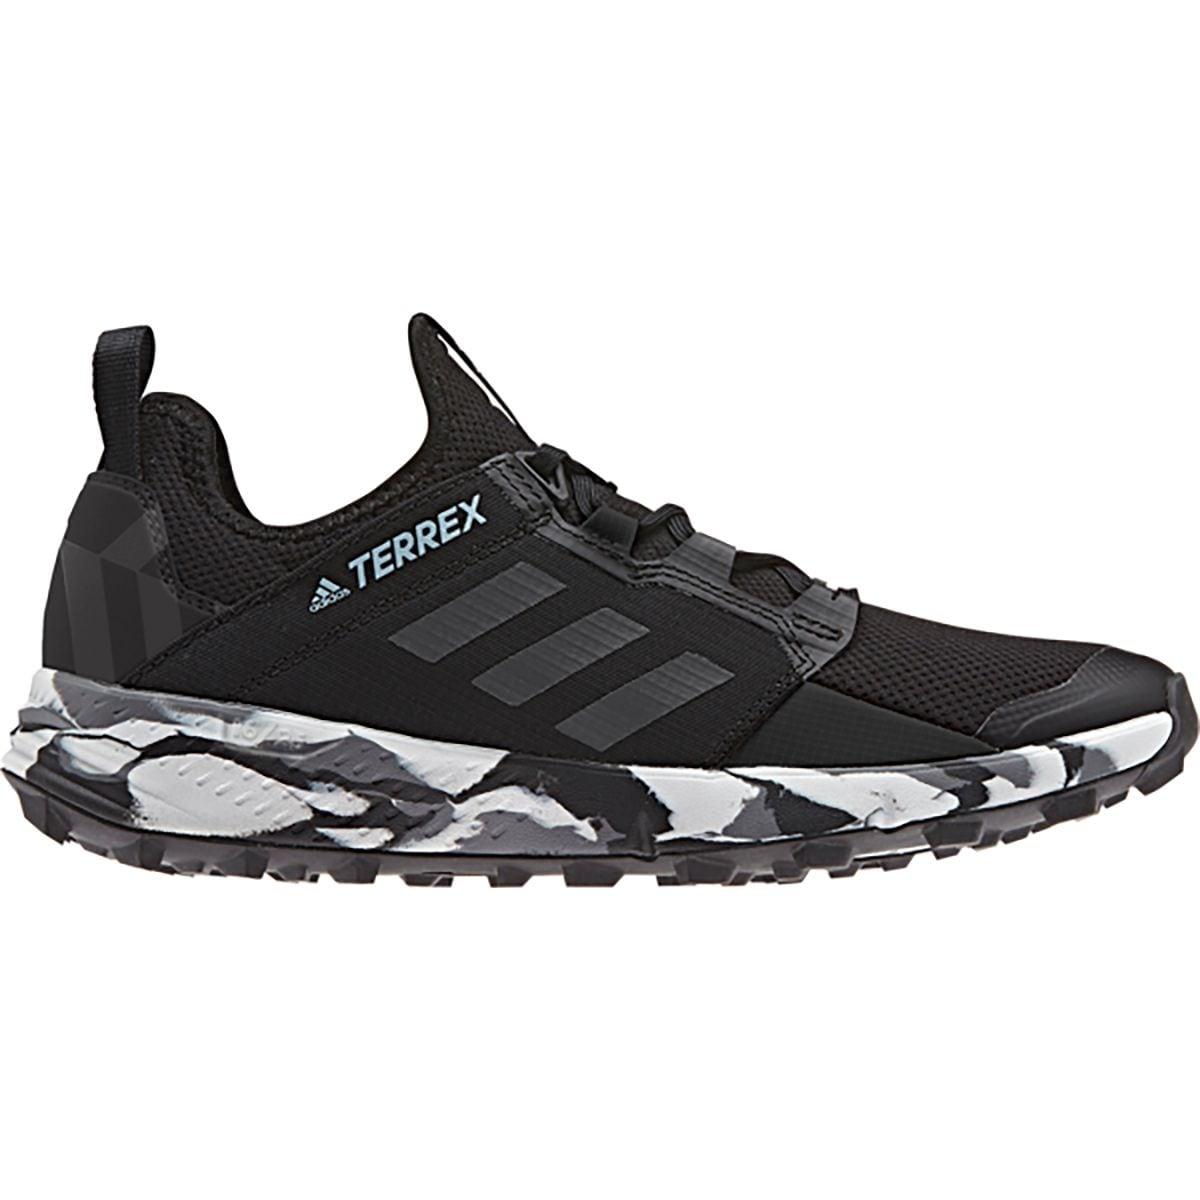 Pedir prestado Gracias detrás  Adidas Outdoor Terrex Agravic Speed Plus Trail Running Shoe - Women's |  Backcountry.com